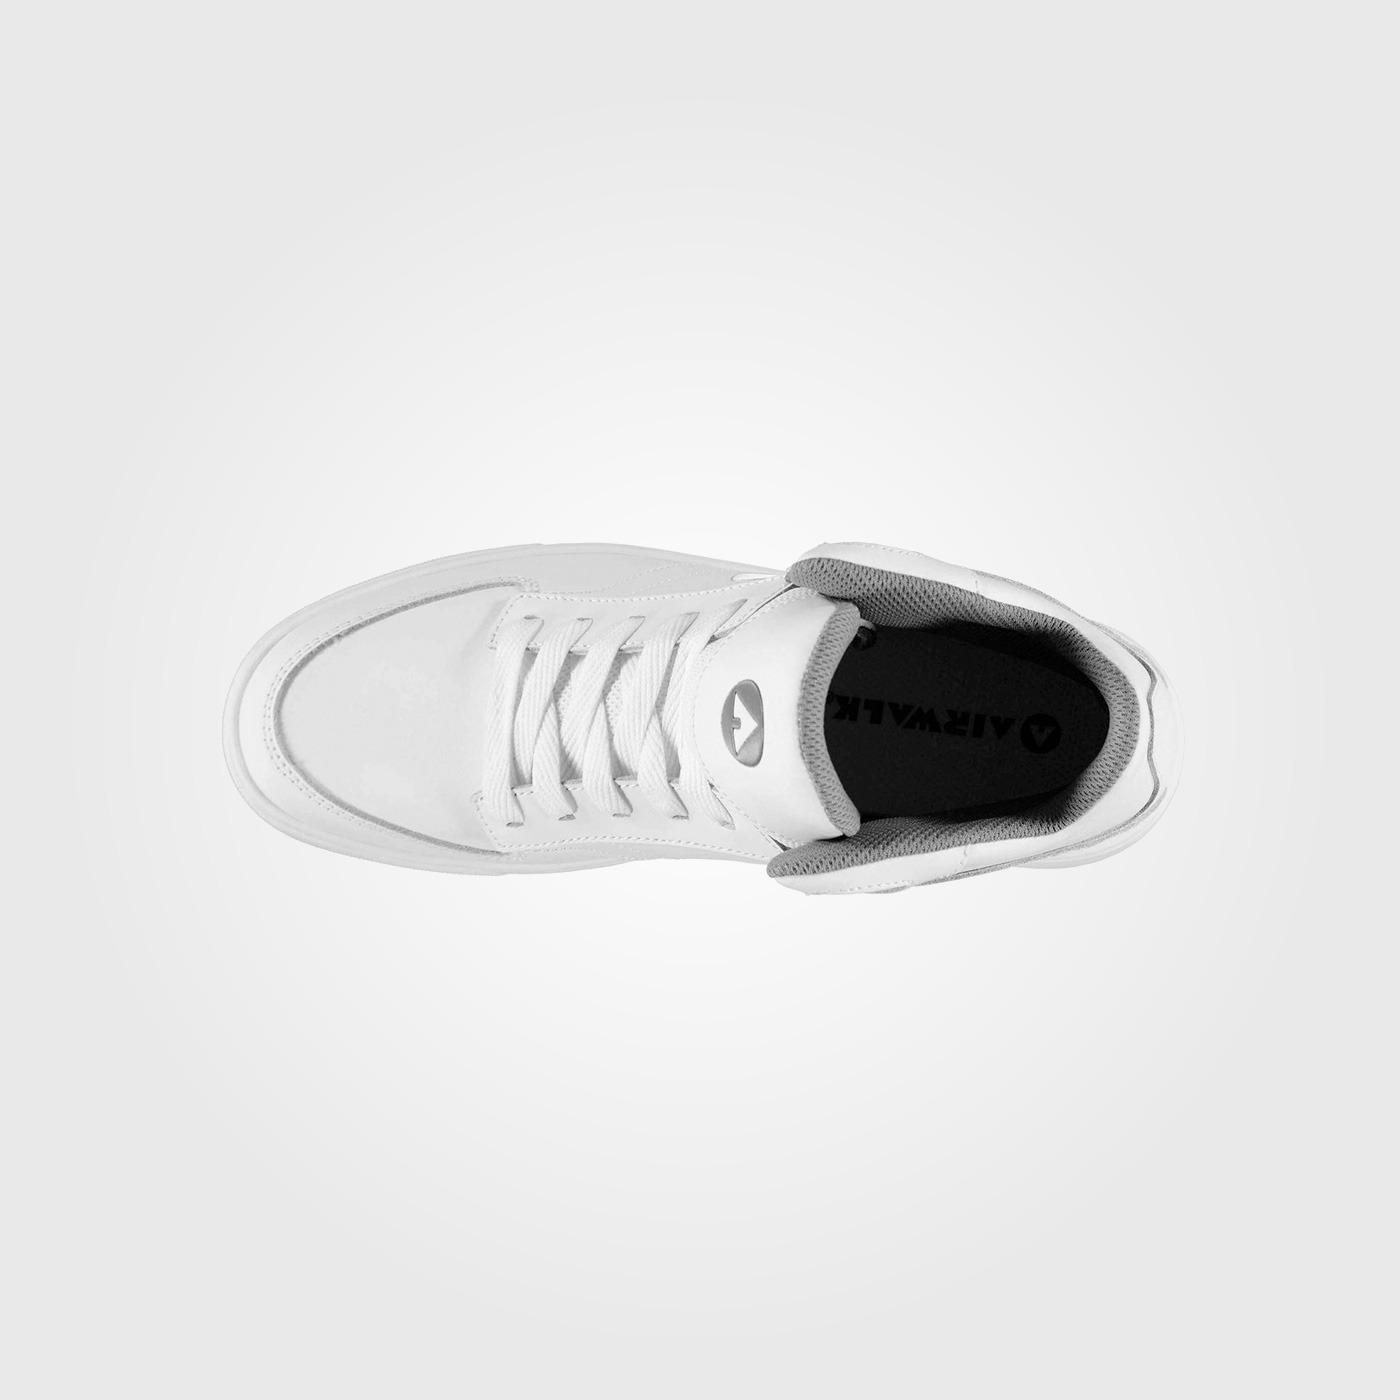 Кроссовки Airwalk Thrasher Mens Skate Shoes White